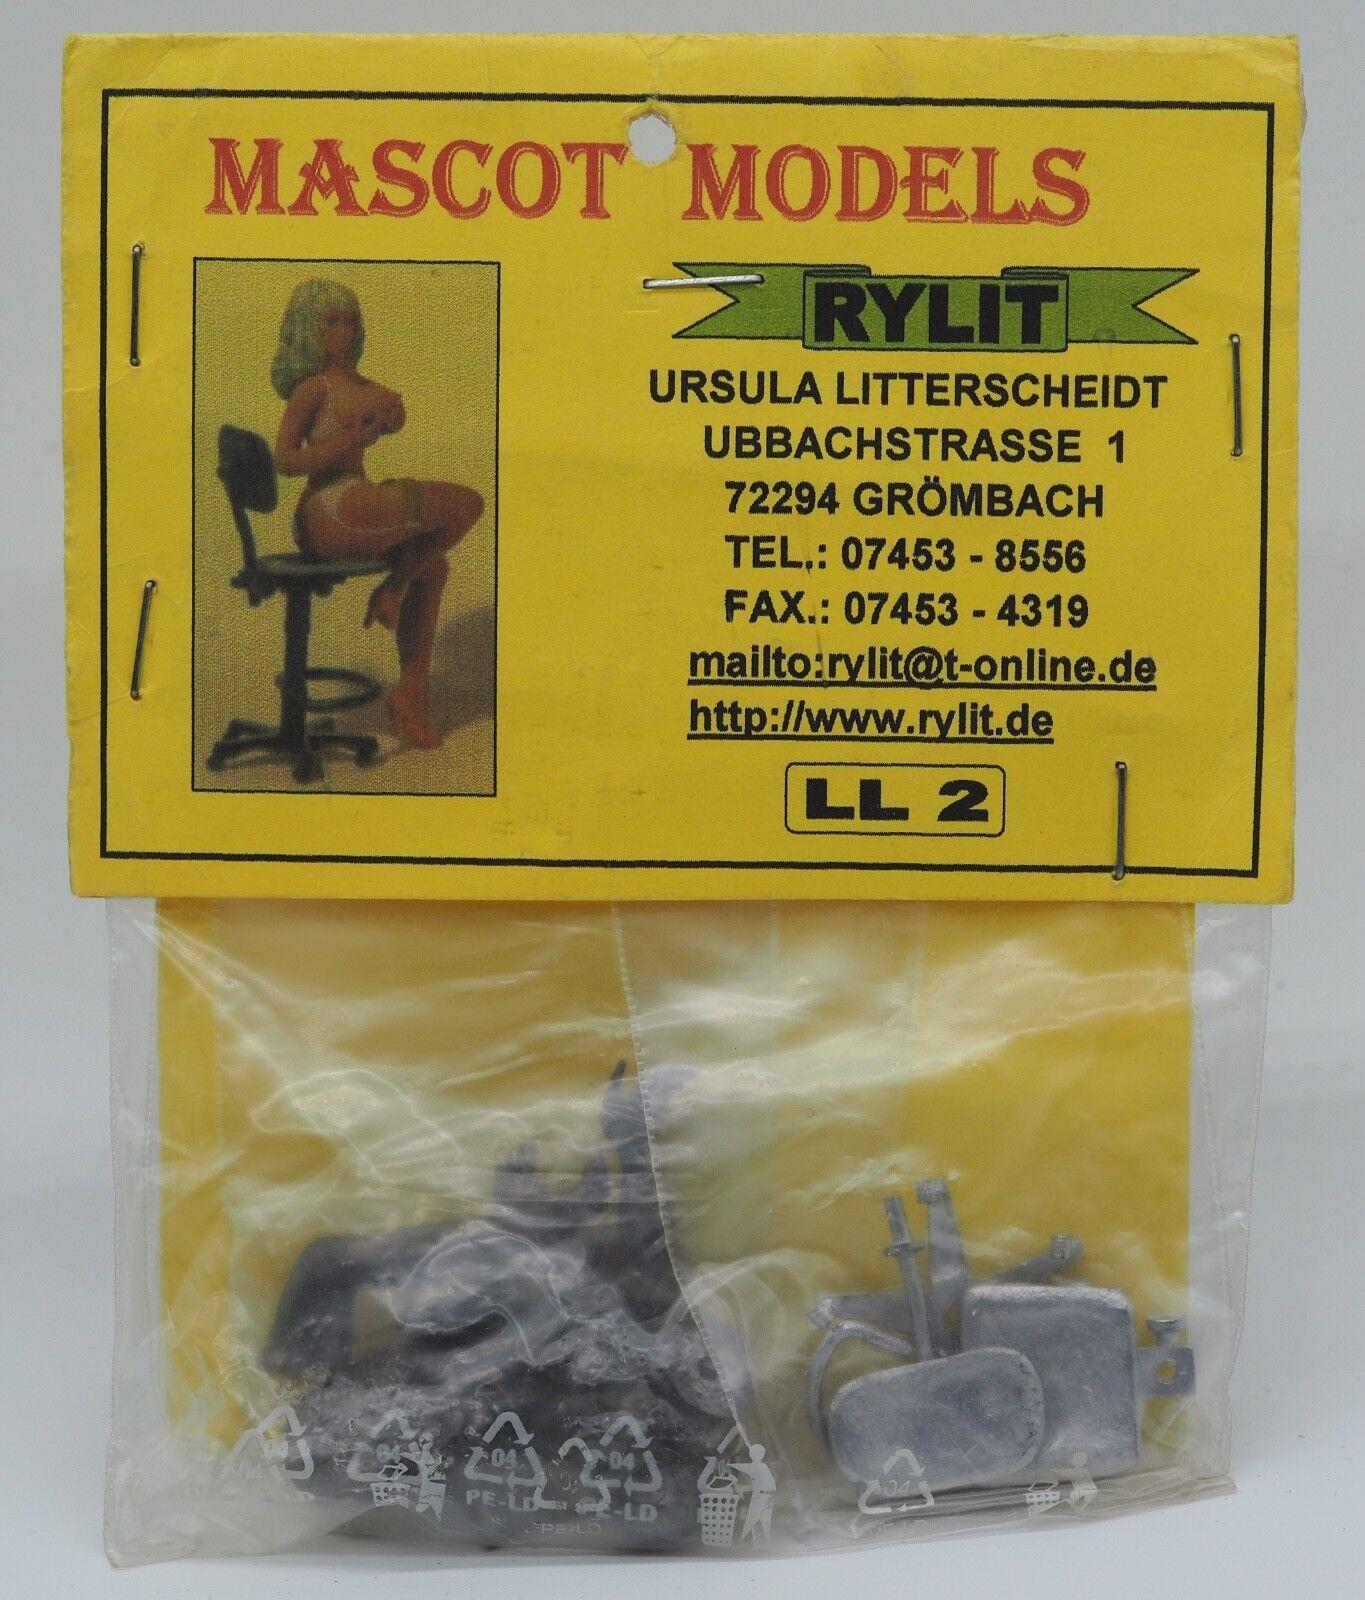 LL2, Tempting Temp incl chair, Mascot Models,90mm Metal Figure,1 18,Brand NEW